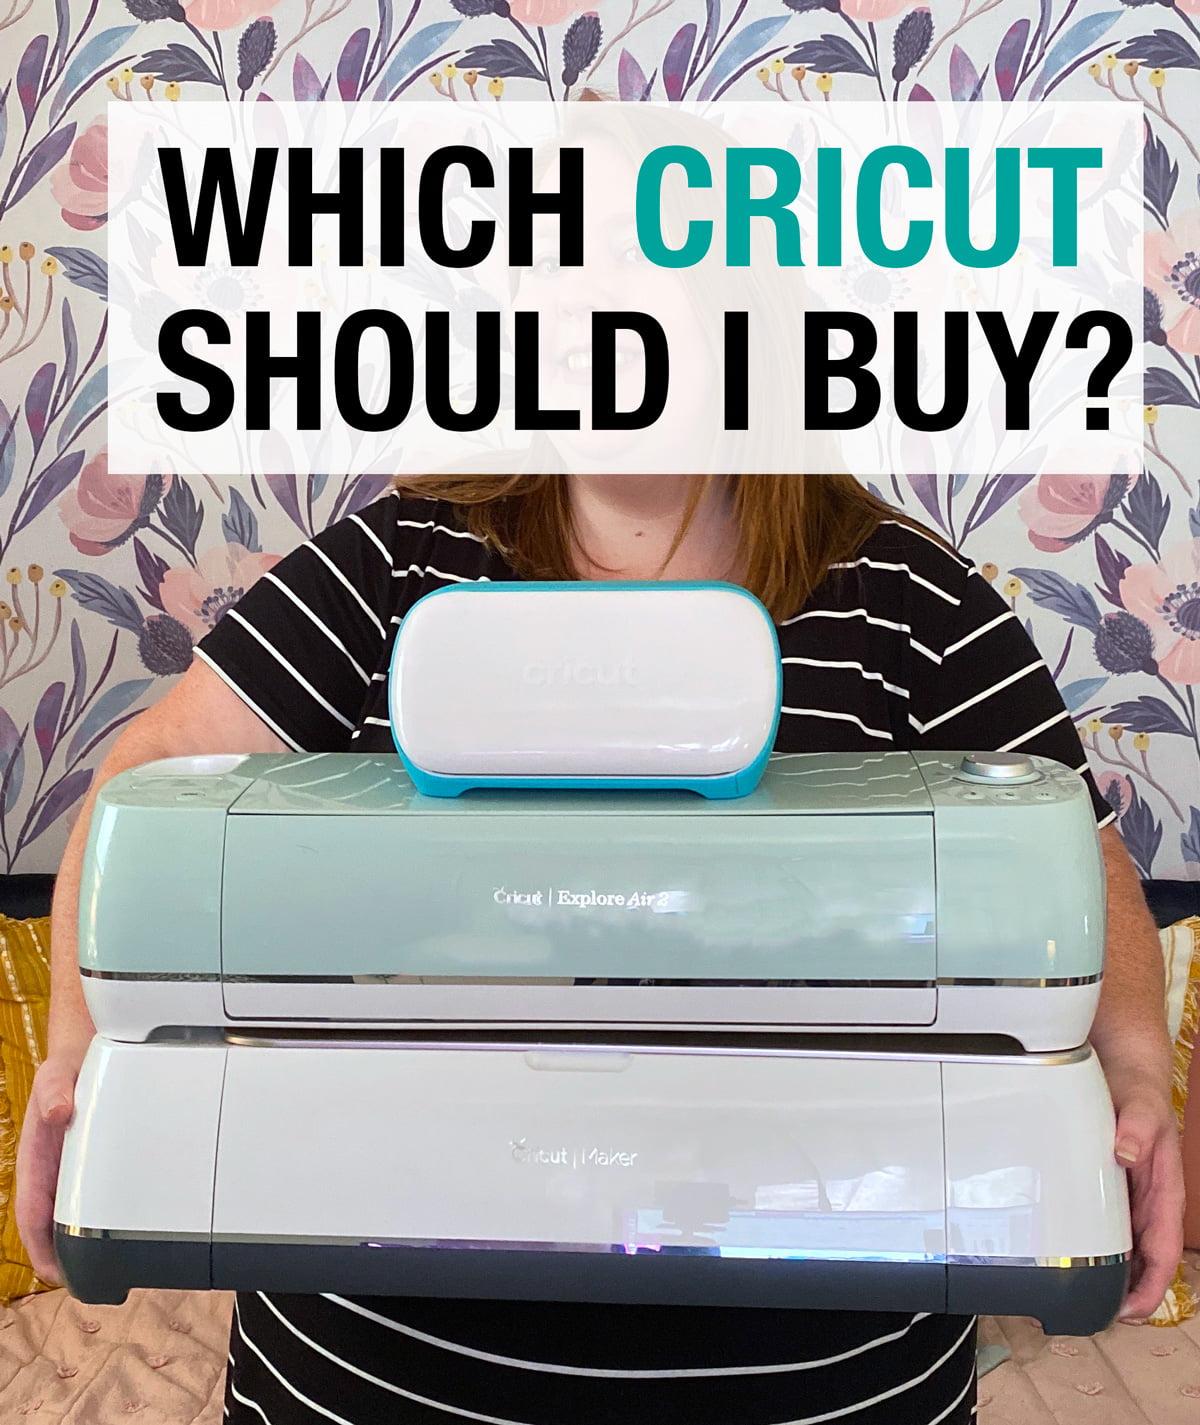 Cricut Machines